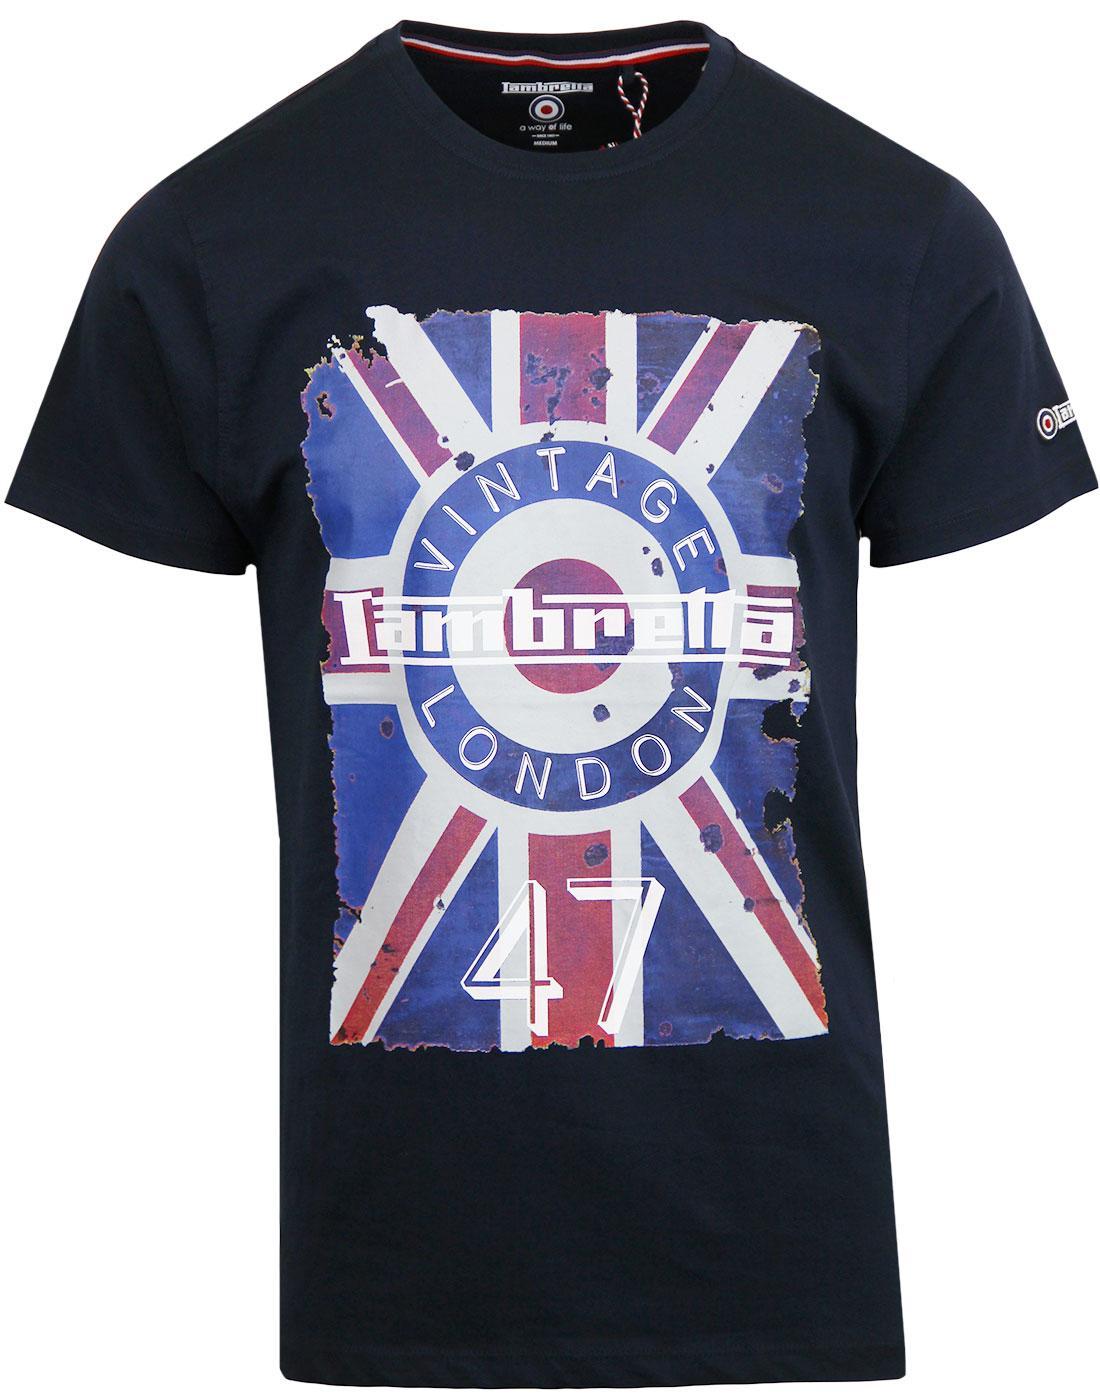 LAMBRETTA Mod Target Union Jack Flag T-shirt NAVY